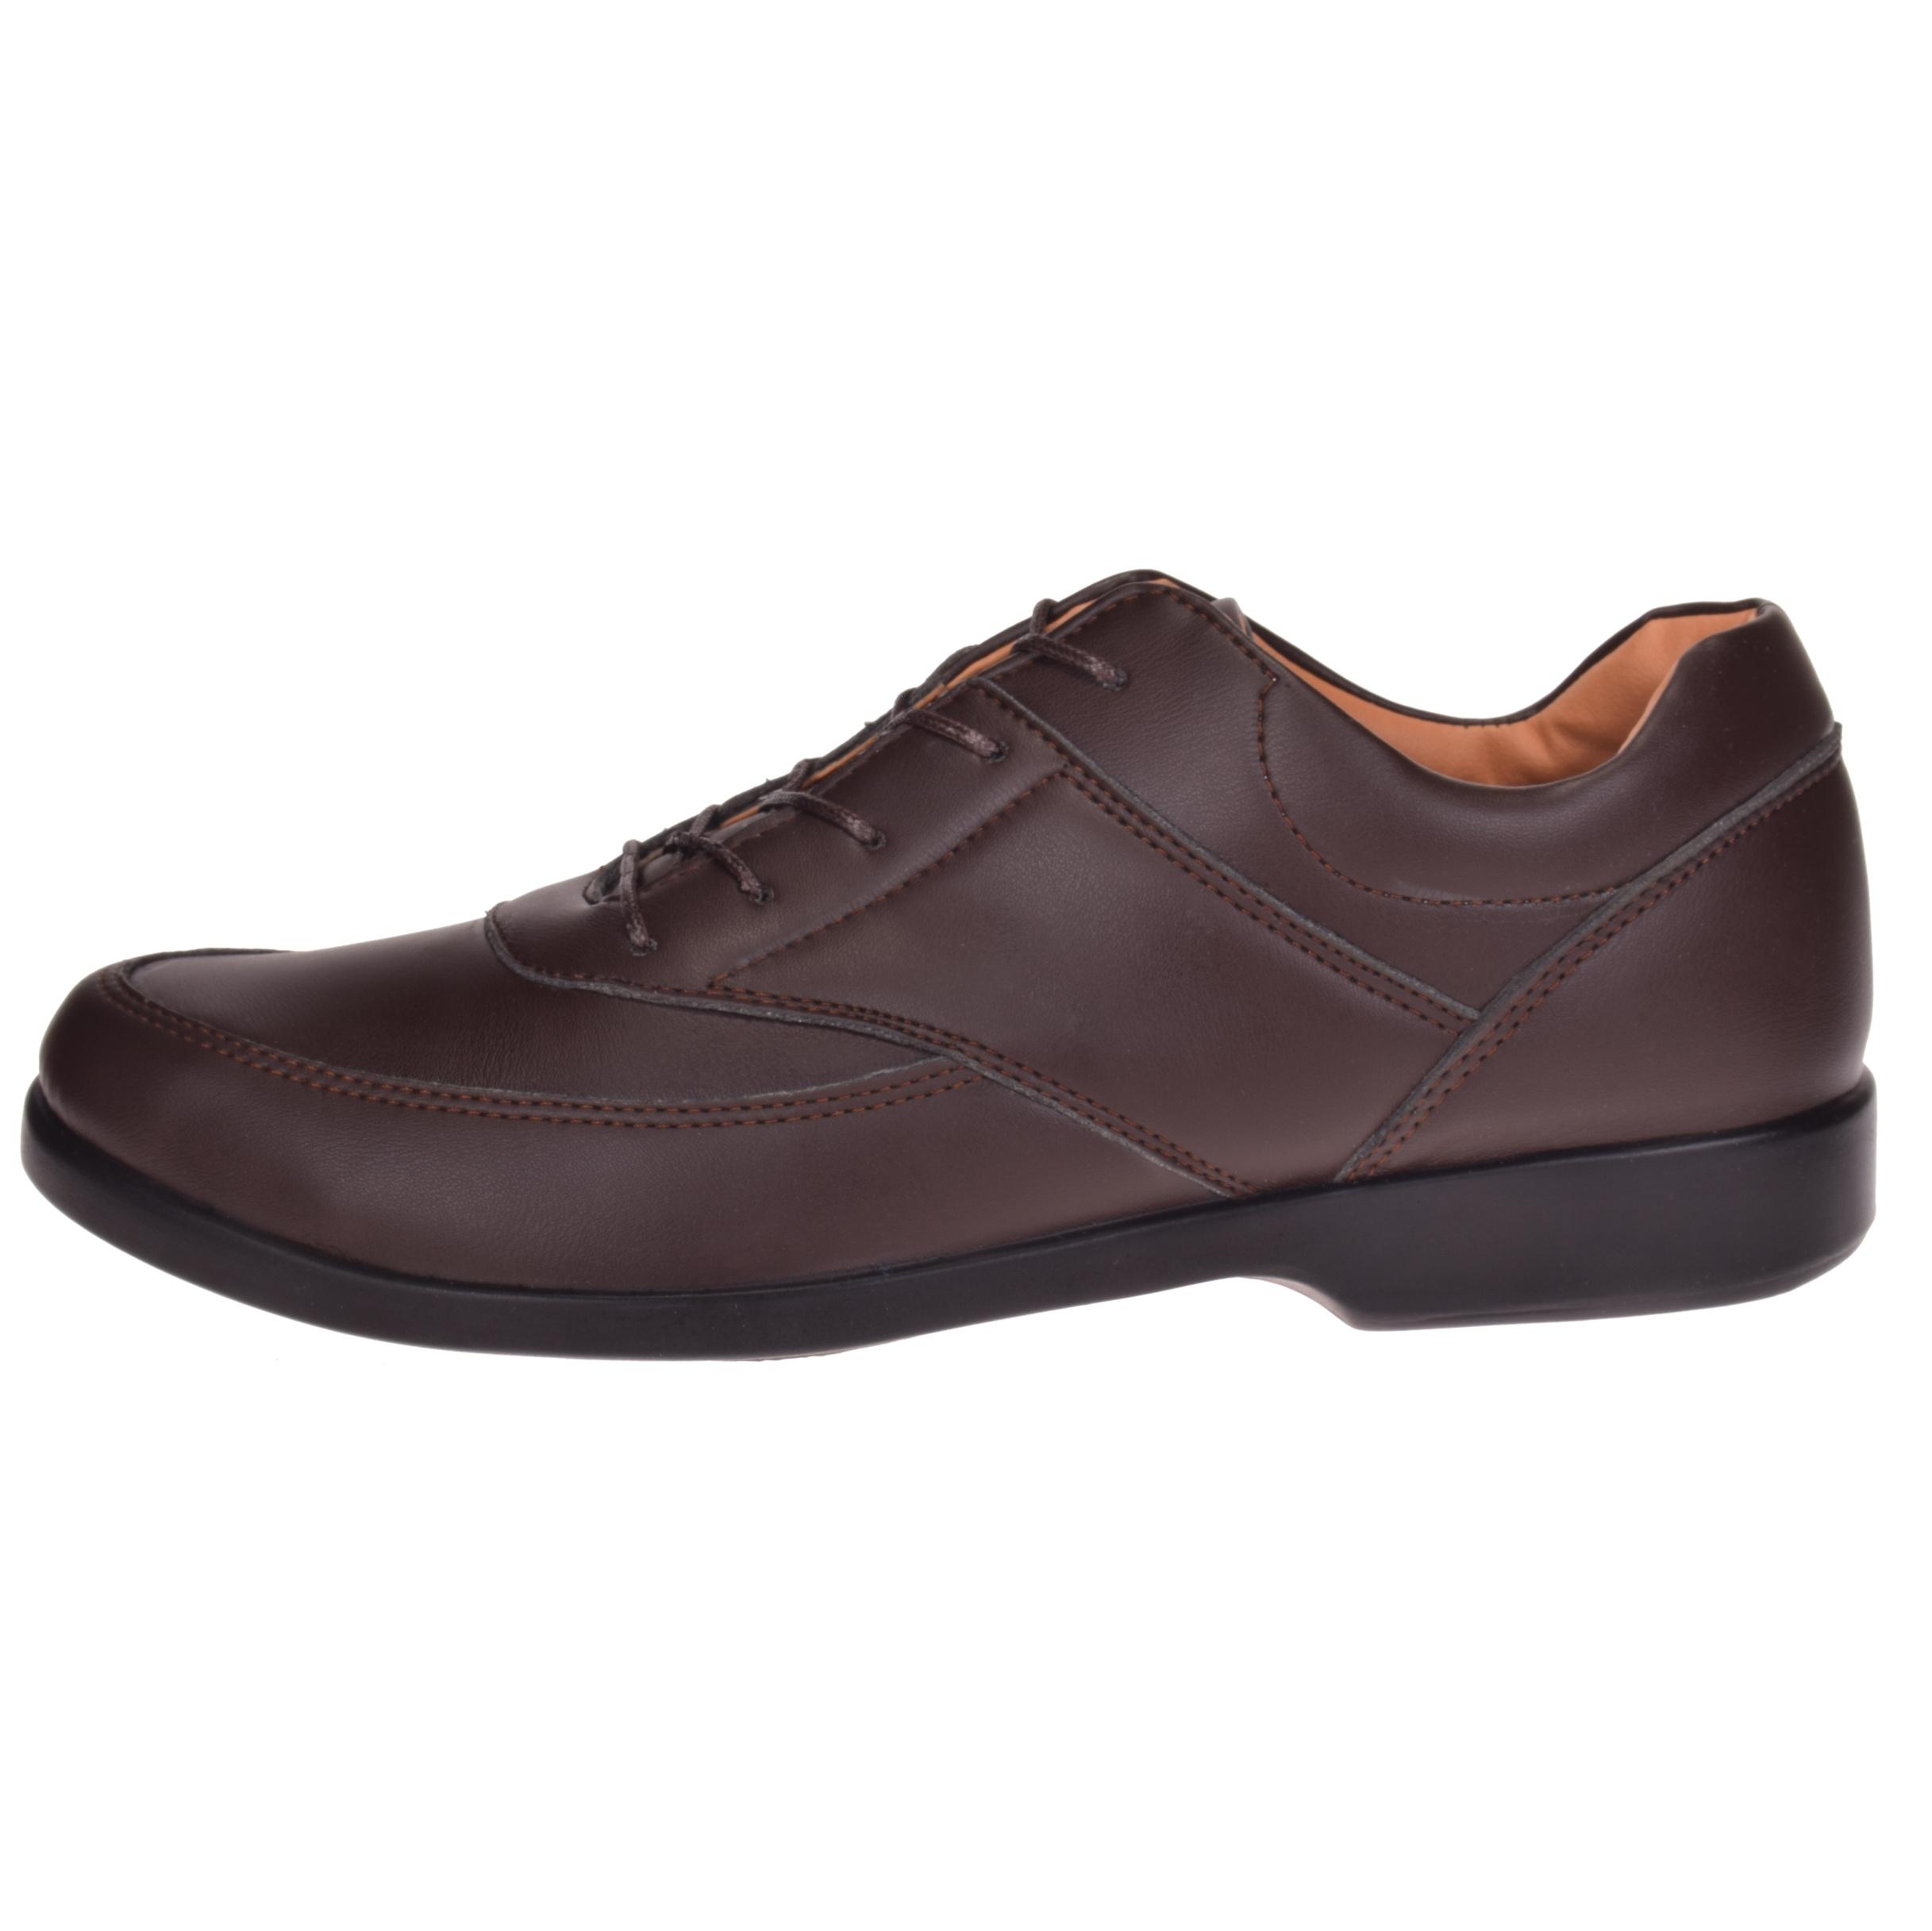 کفش روزمره مردانه ای ال ام کد 1359